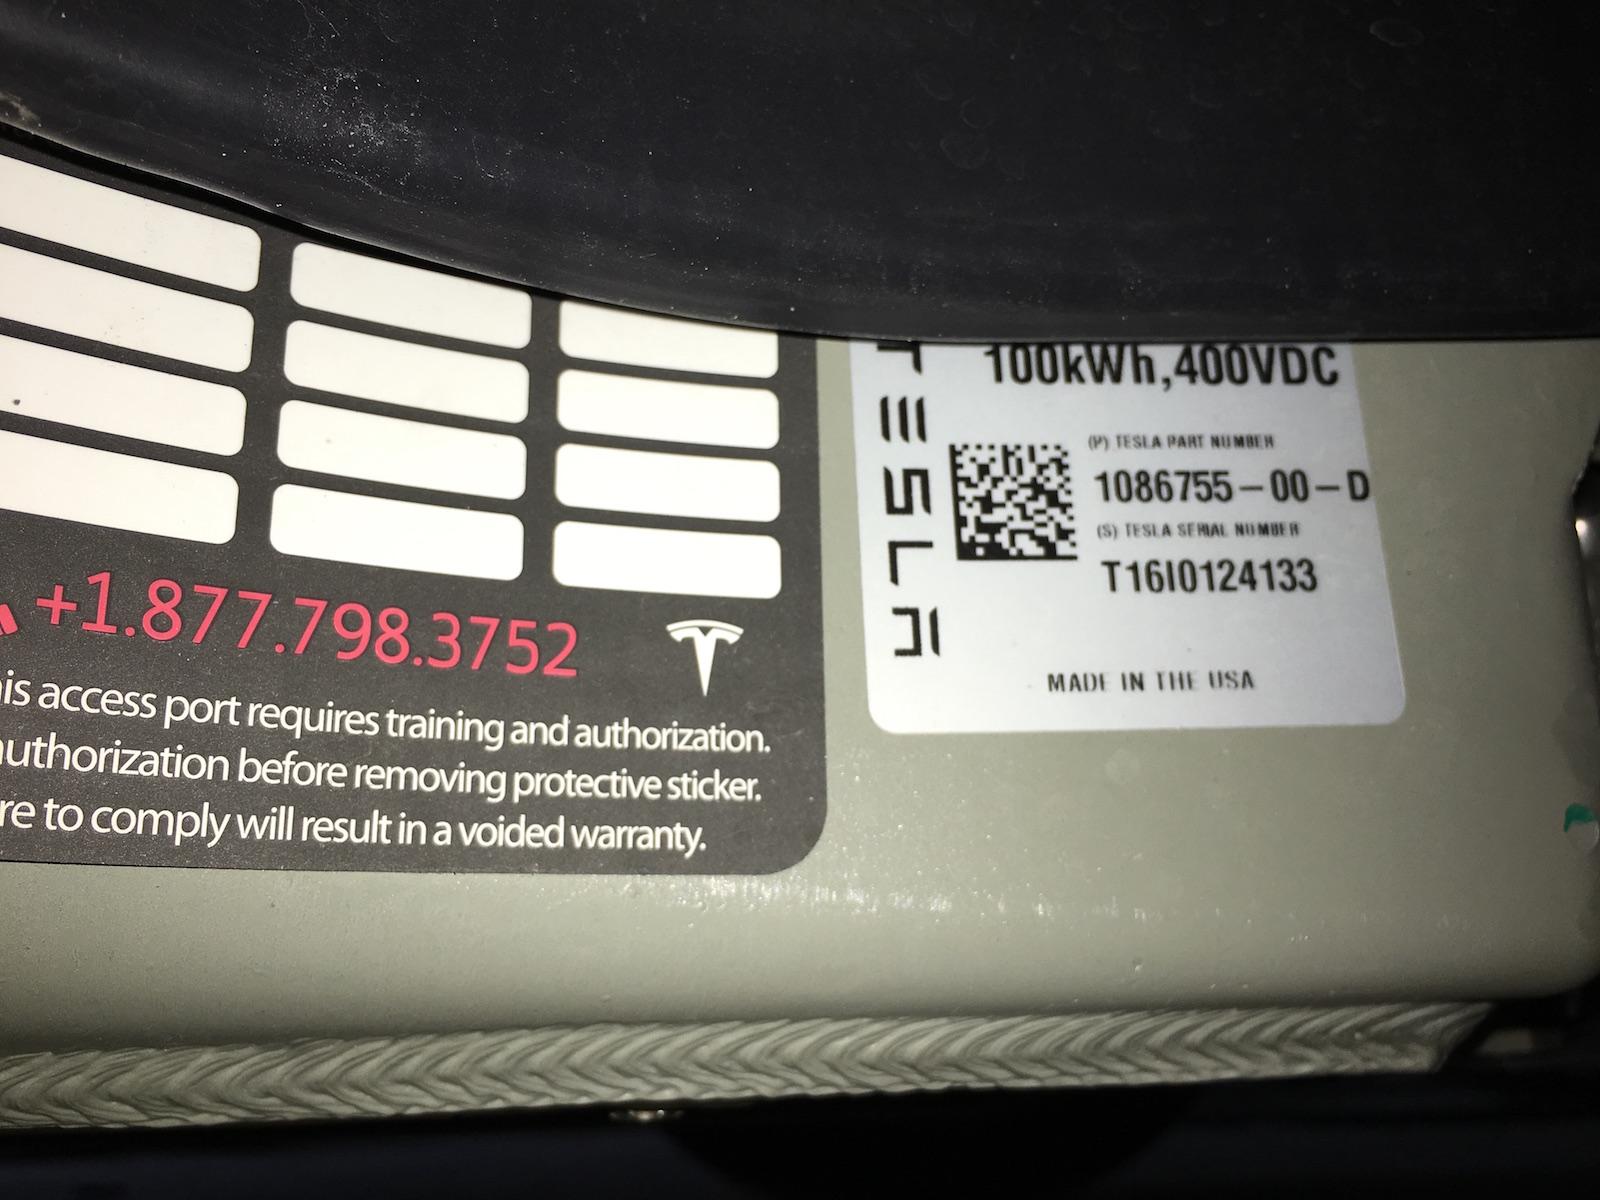 tesla-100kwh-p100d-battery-serial